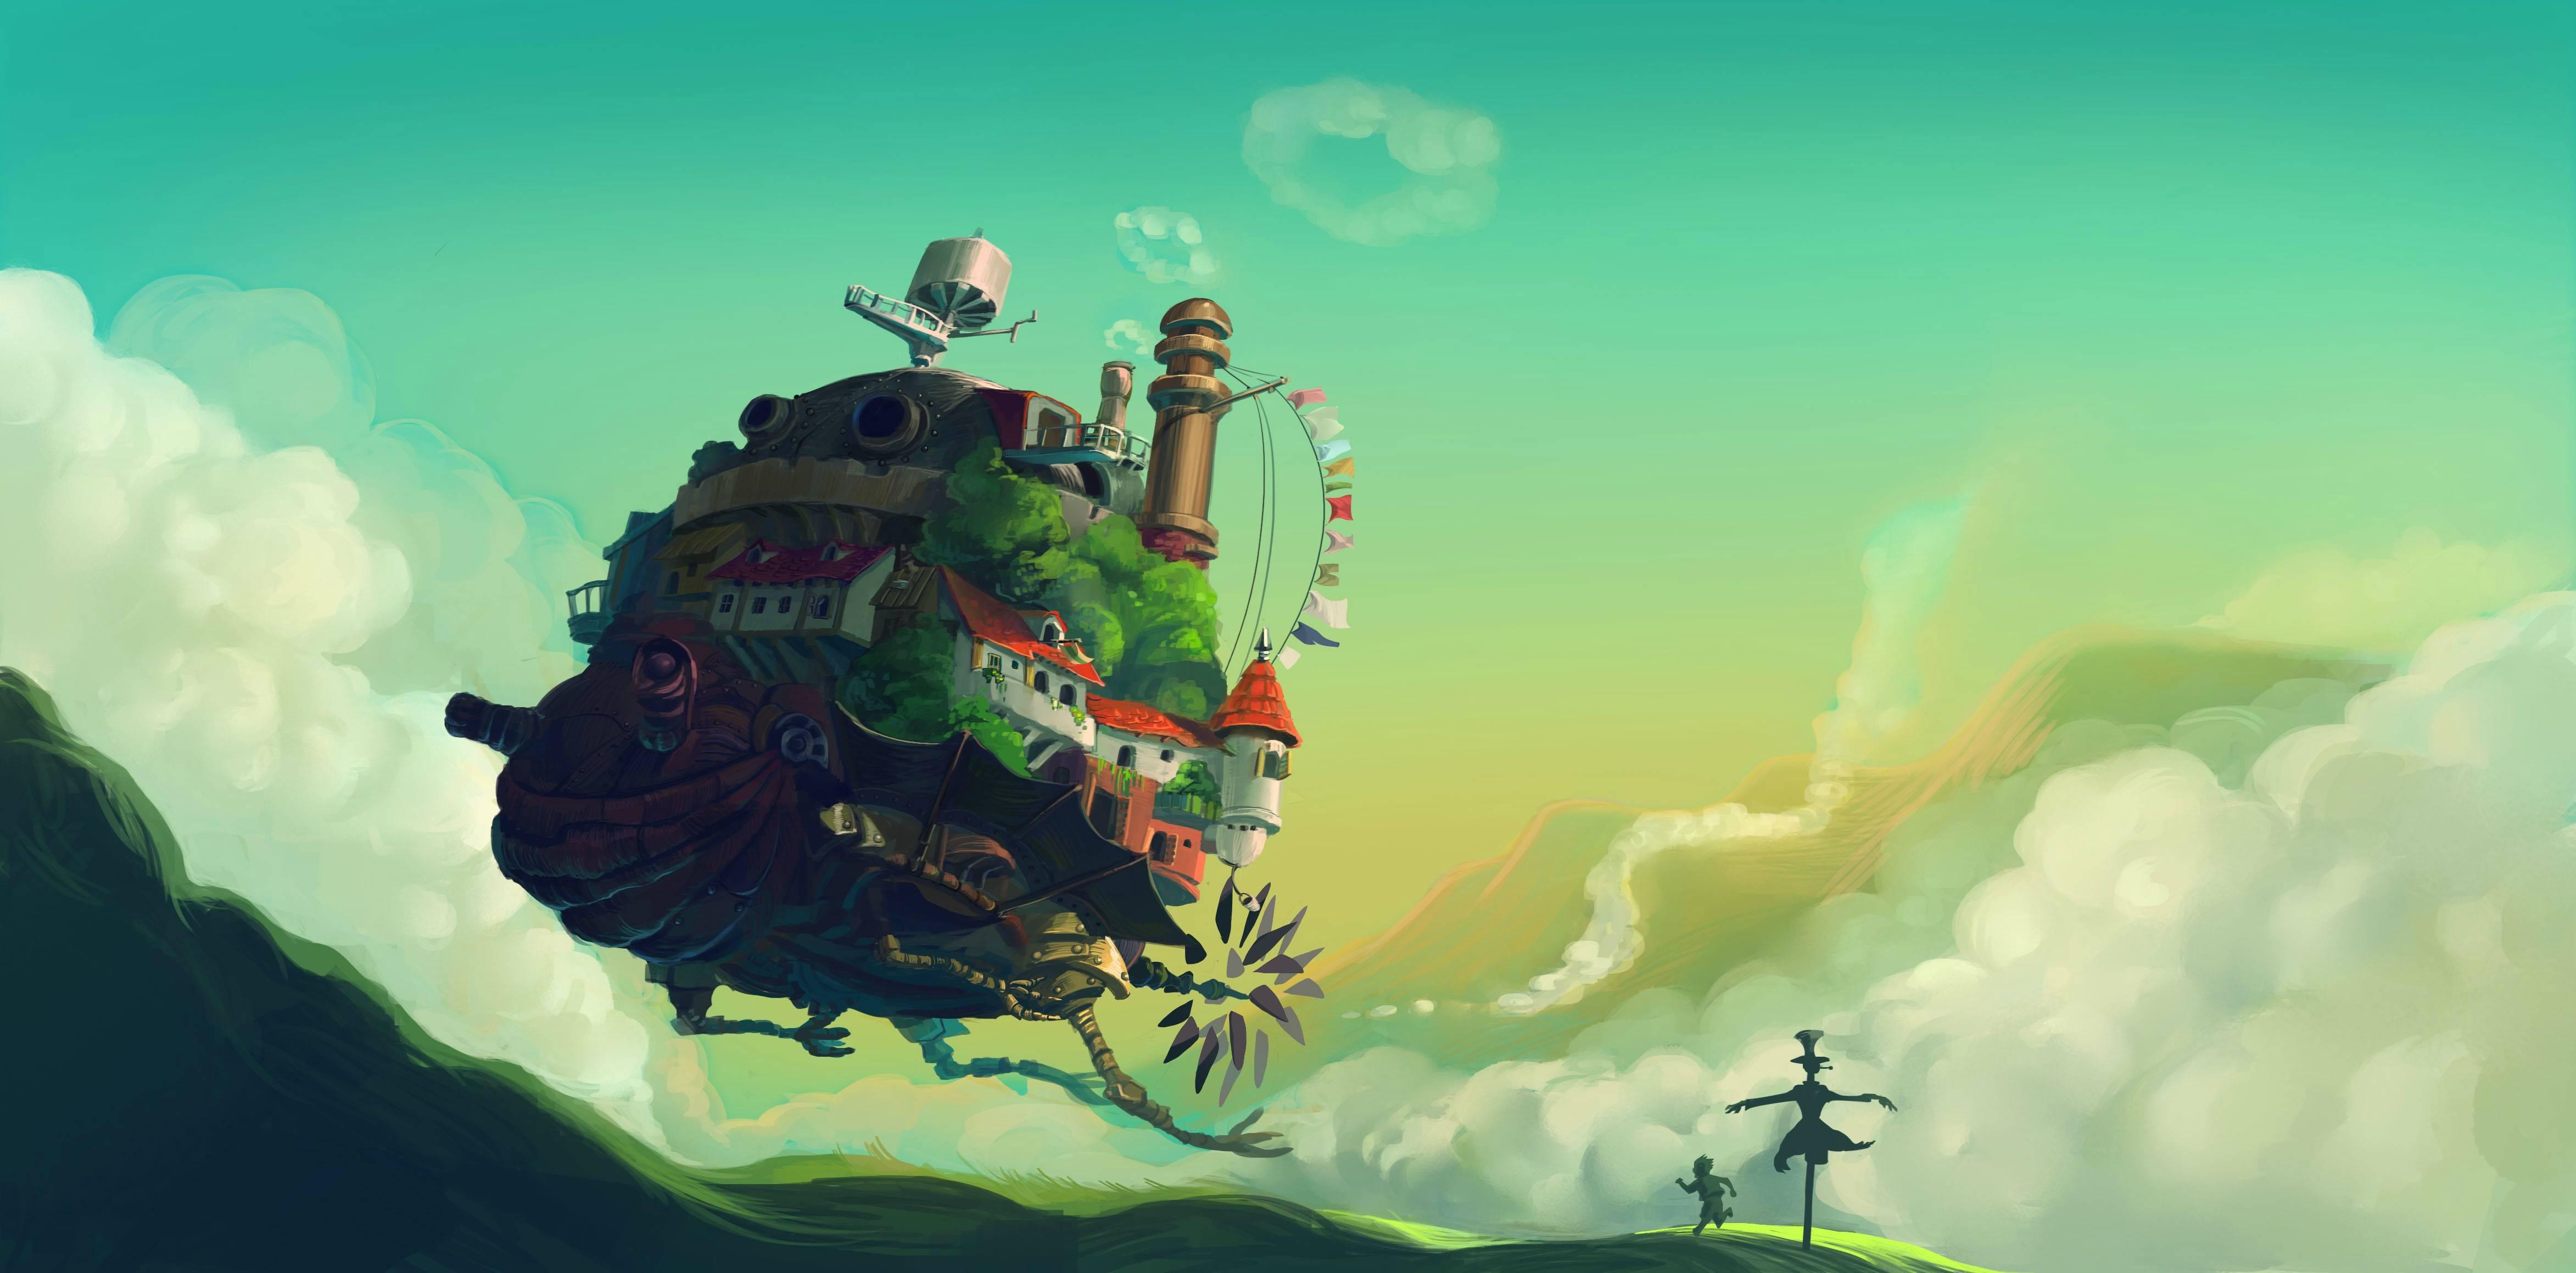 Ghibli Wallpapers Top Free Ghibli Backgrounds